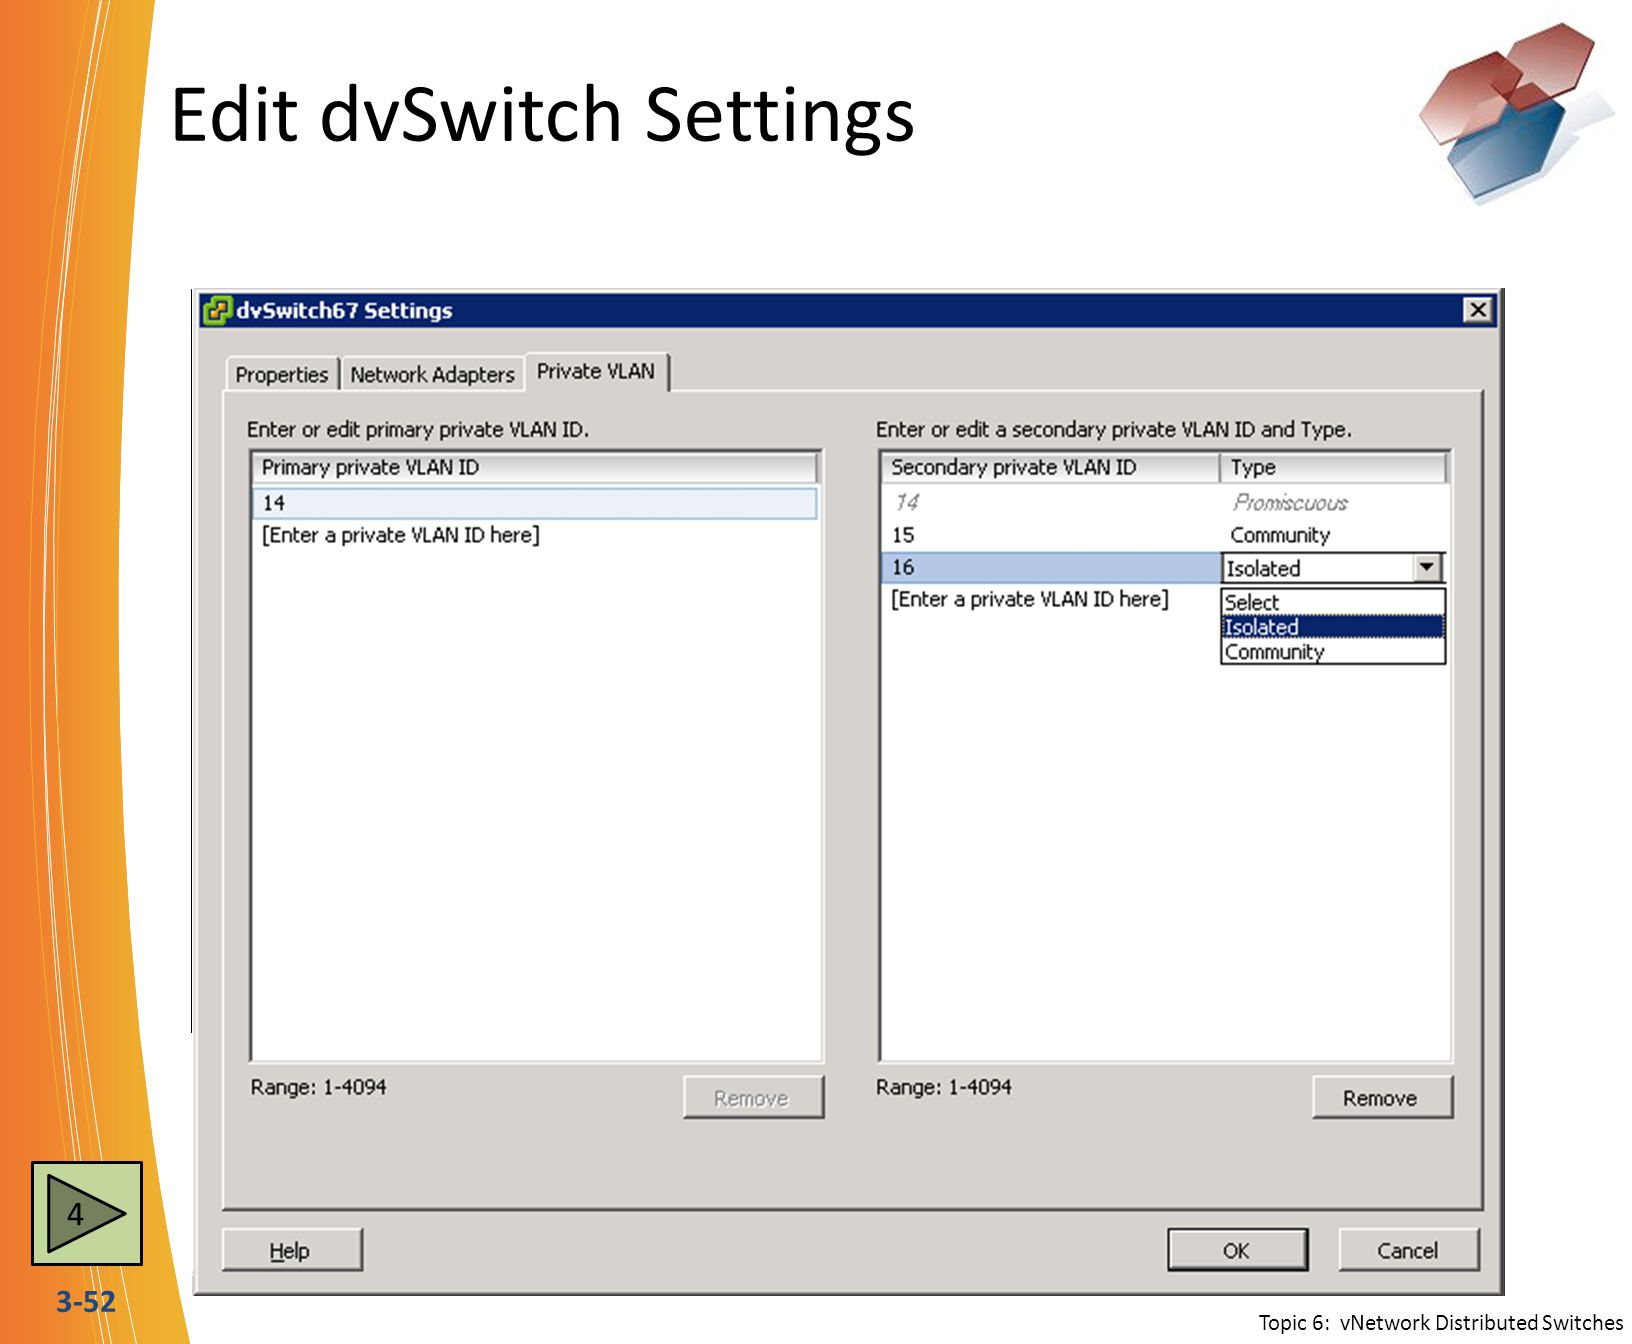 Edit dvSwitch Settings